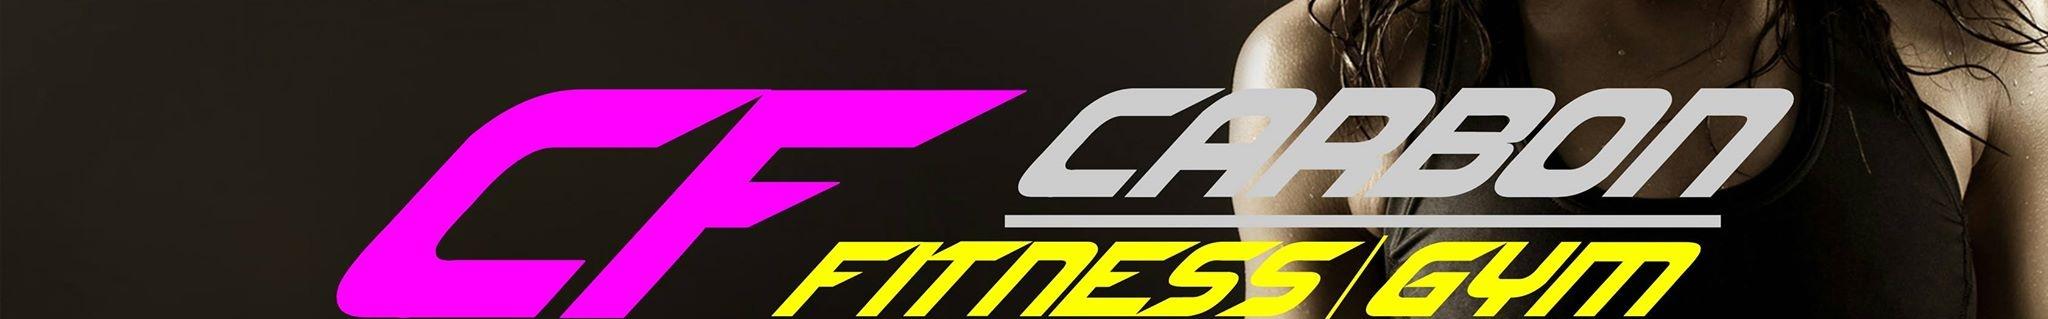 Carbon sportközpont-Banner